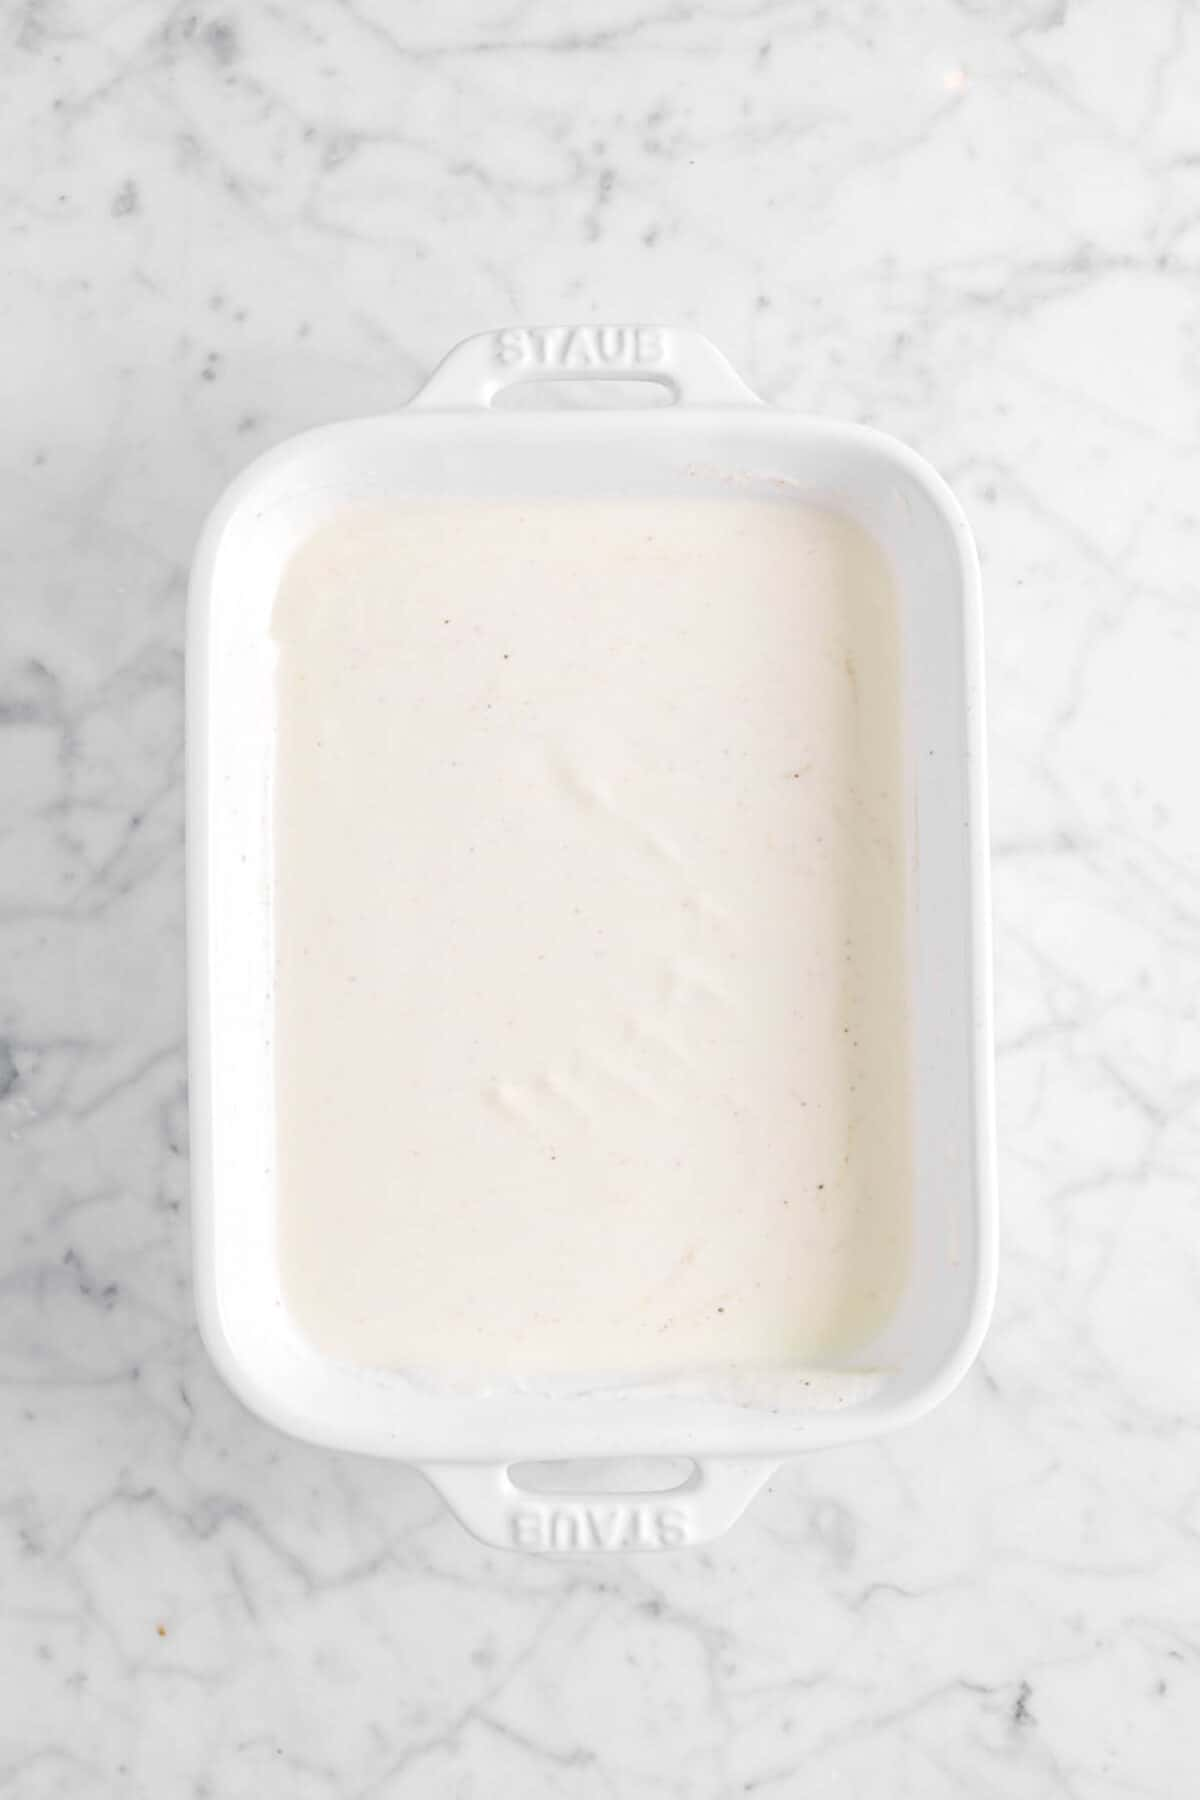 eggnog in a small casserole